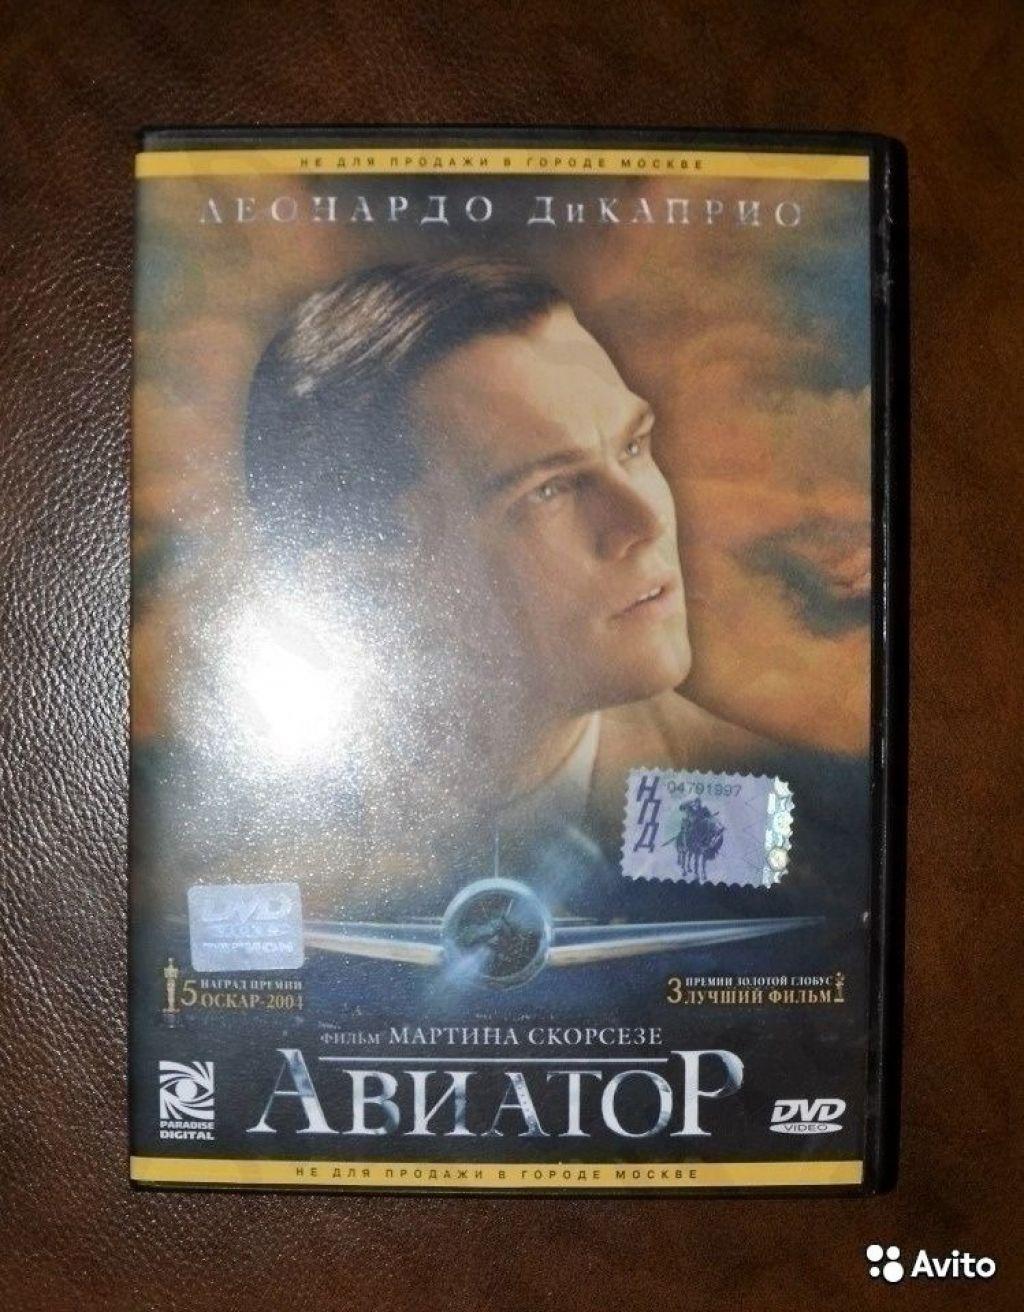 Фильм Мартина Скорцезе Авиатор на DVD в Москве. Фото 1